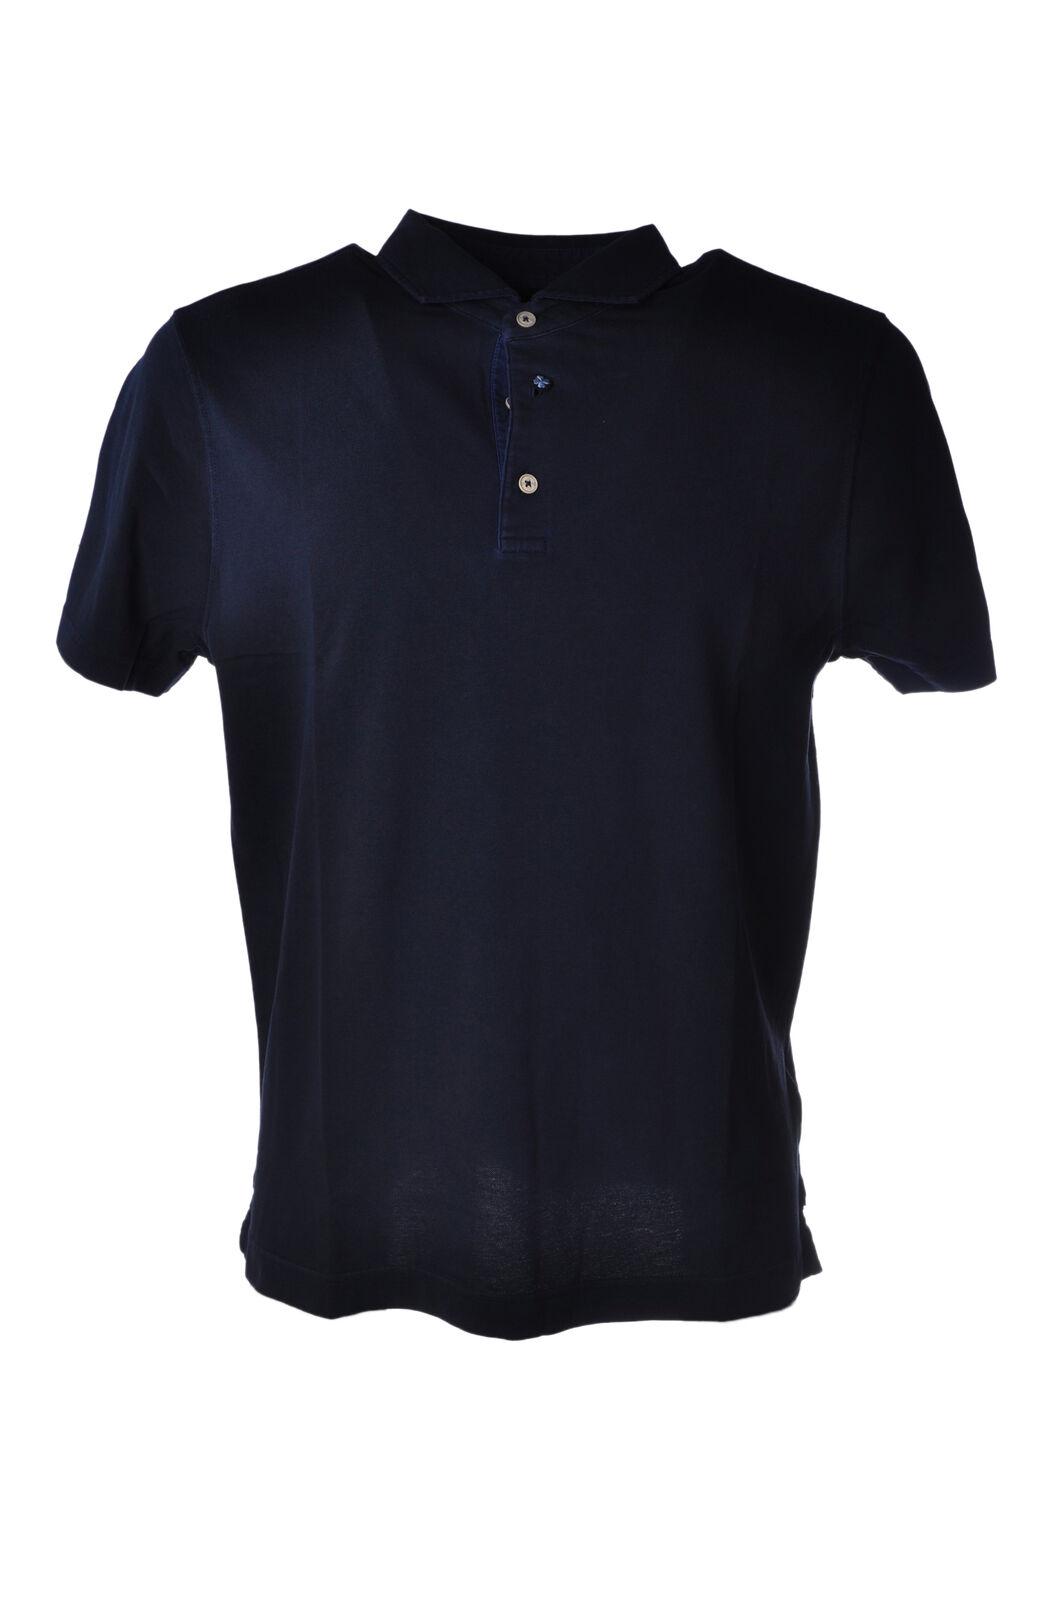 Heritage - Topwear Polo - Mann - Blau - 5025431G184339